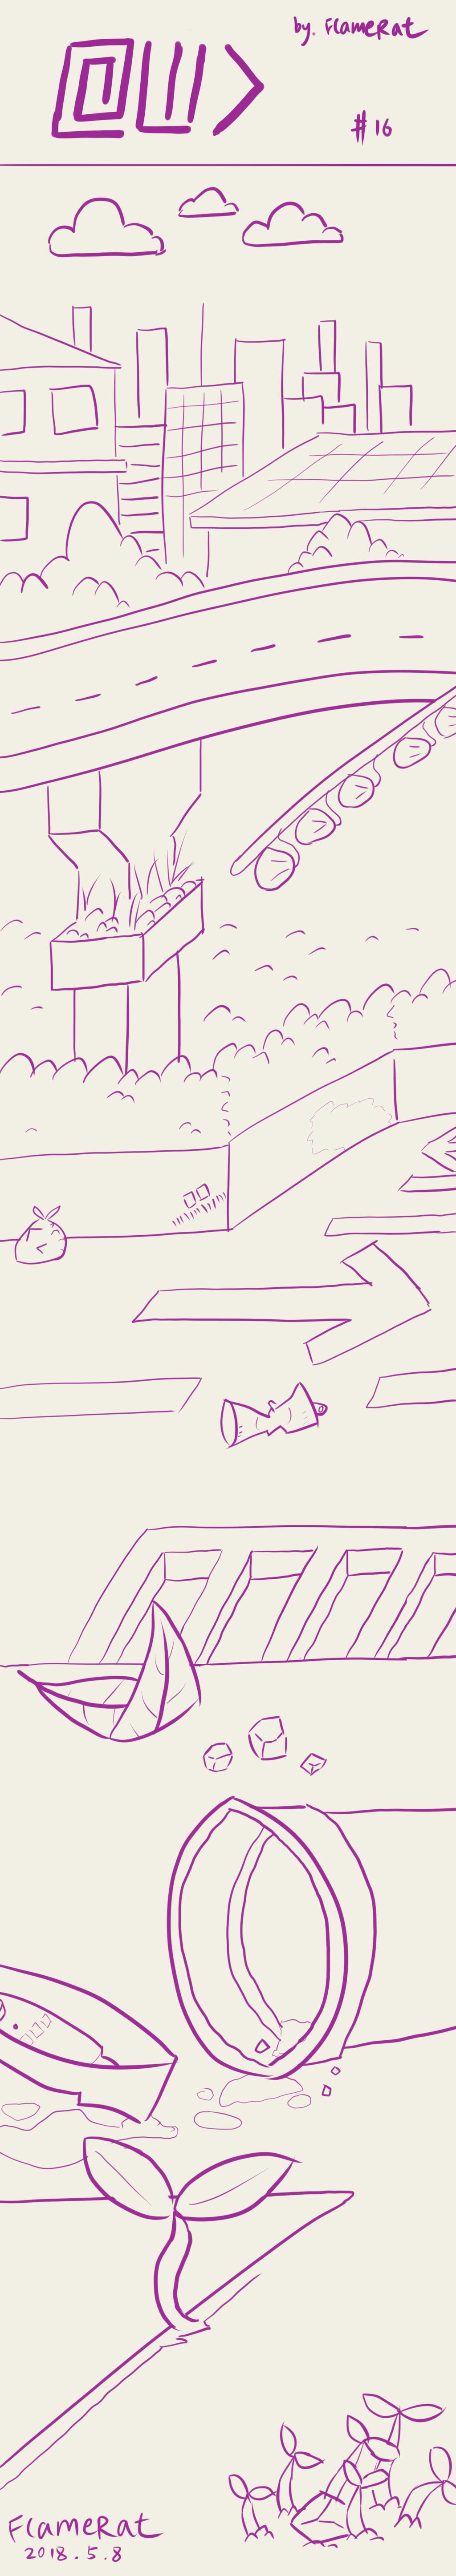 [Comic] At Wild Do #16 by FlameRat-YehLon